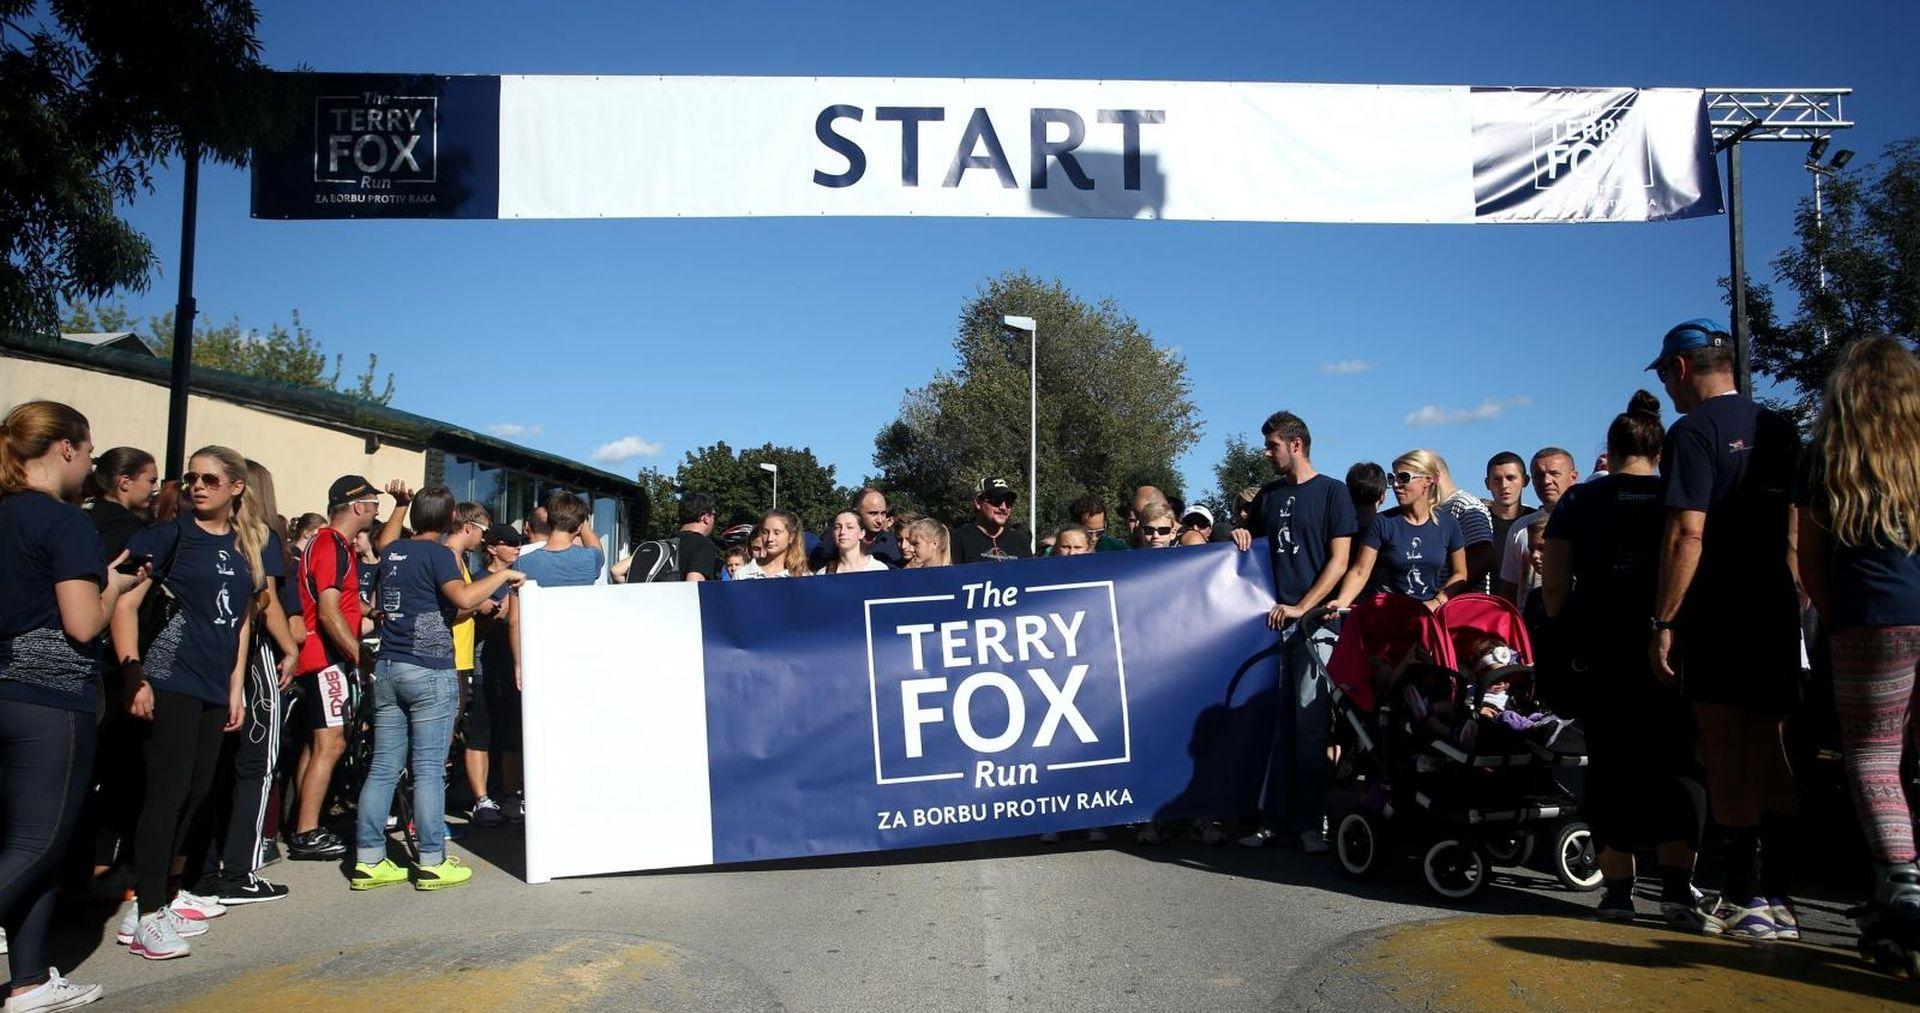 Terry fox Run 23. rujna na Jarunu